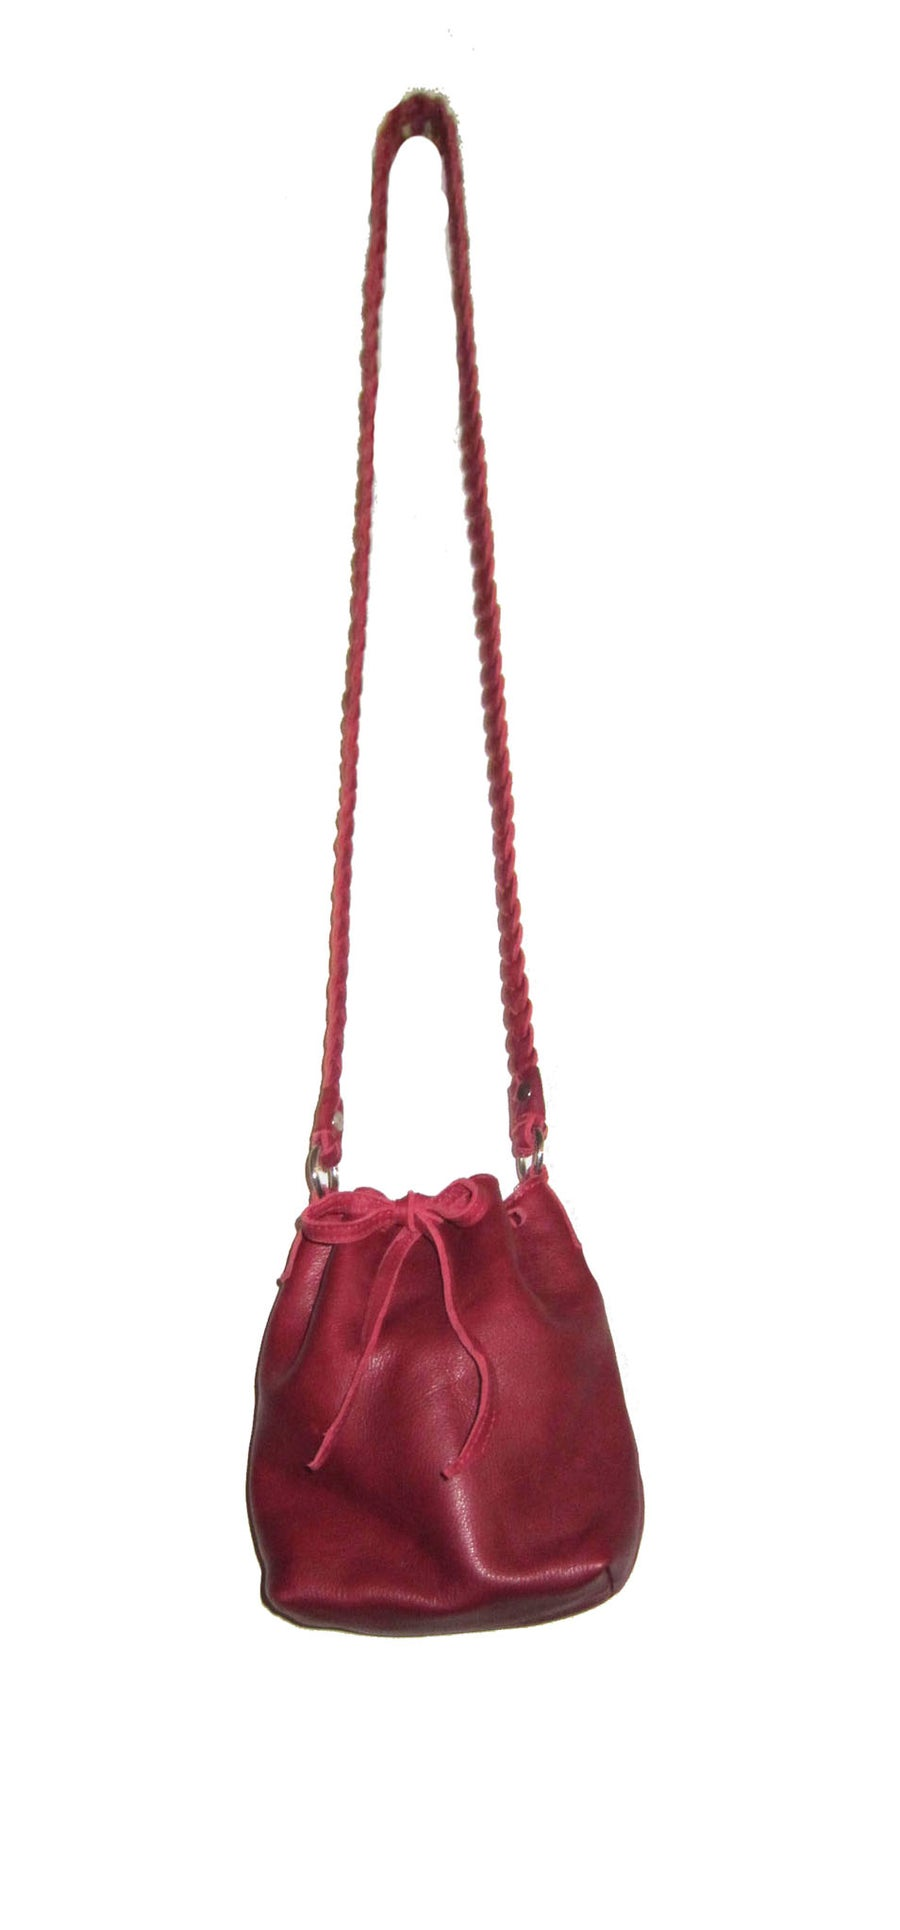 Image of Wildflower Cross-body Bucket Bag ~SM~